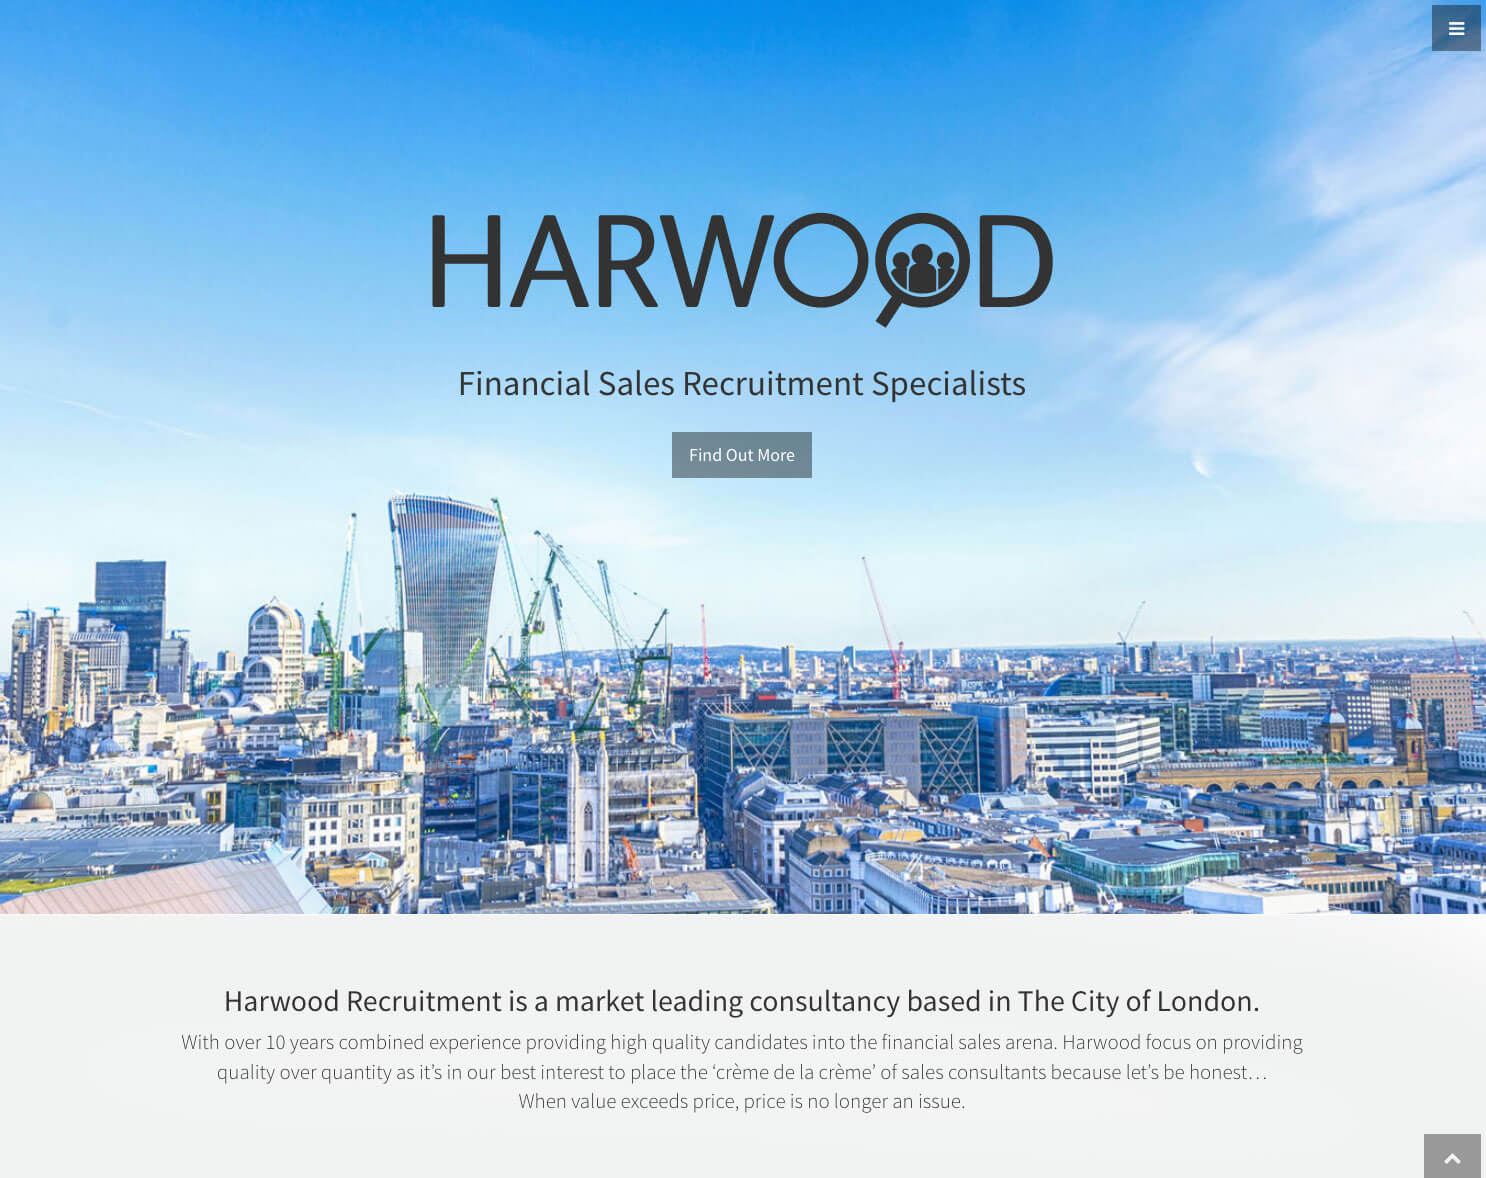 Harwood Recruitment employs new responsive microsite